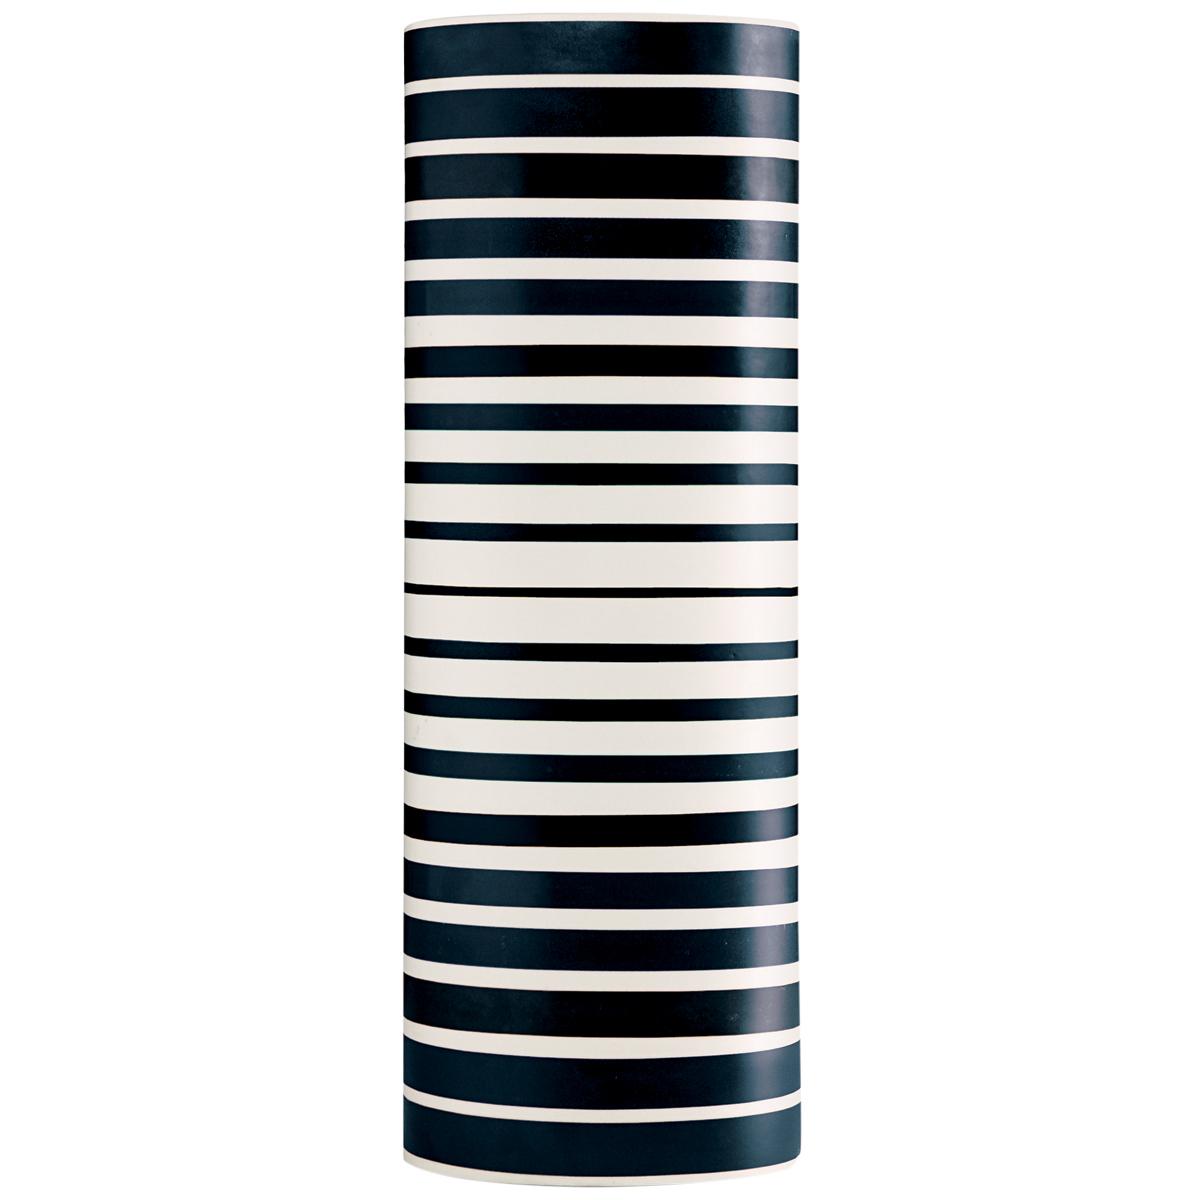 black-white-red-furniture-accessories-1